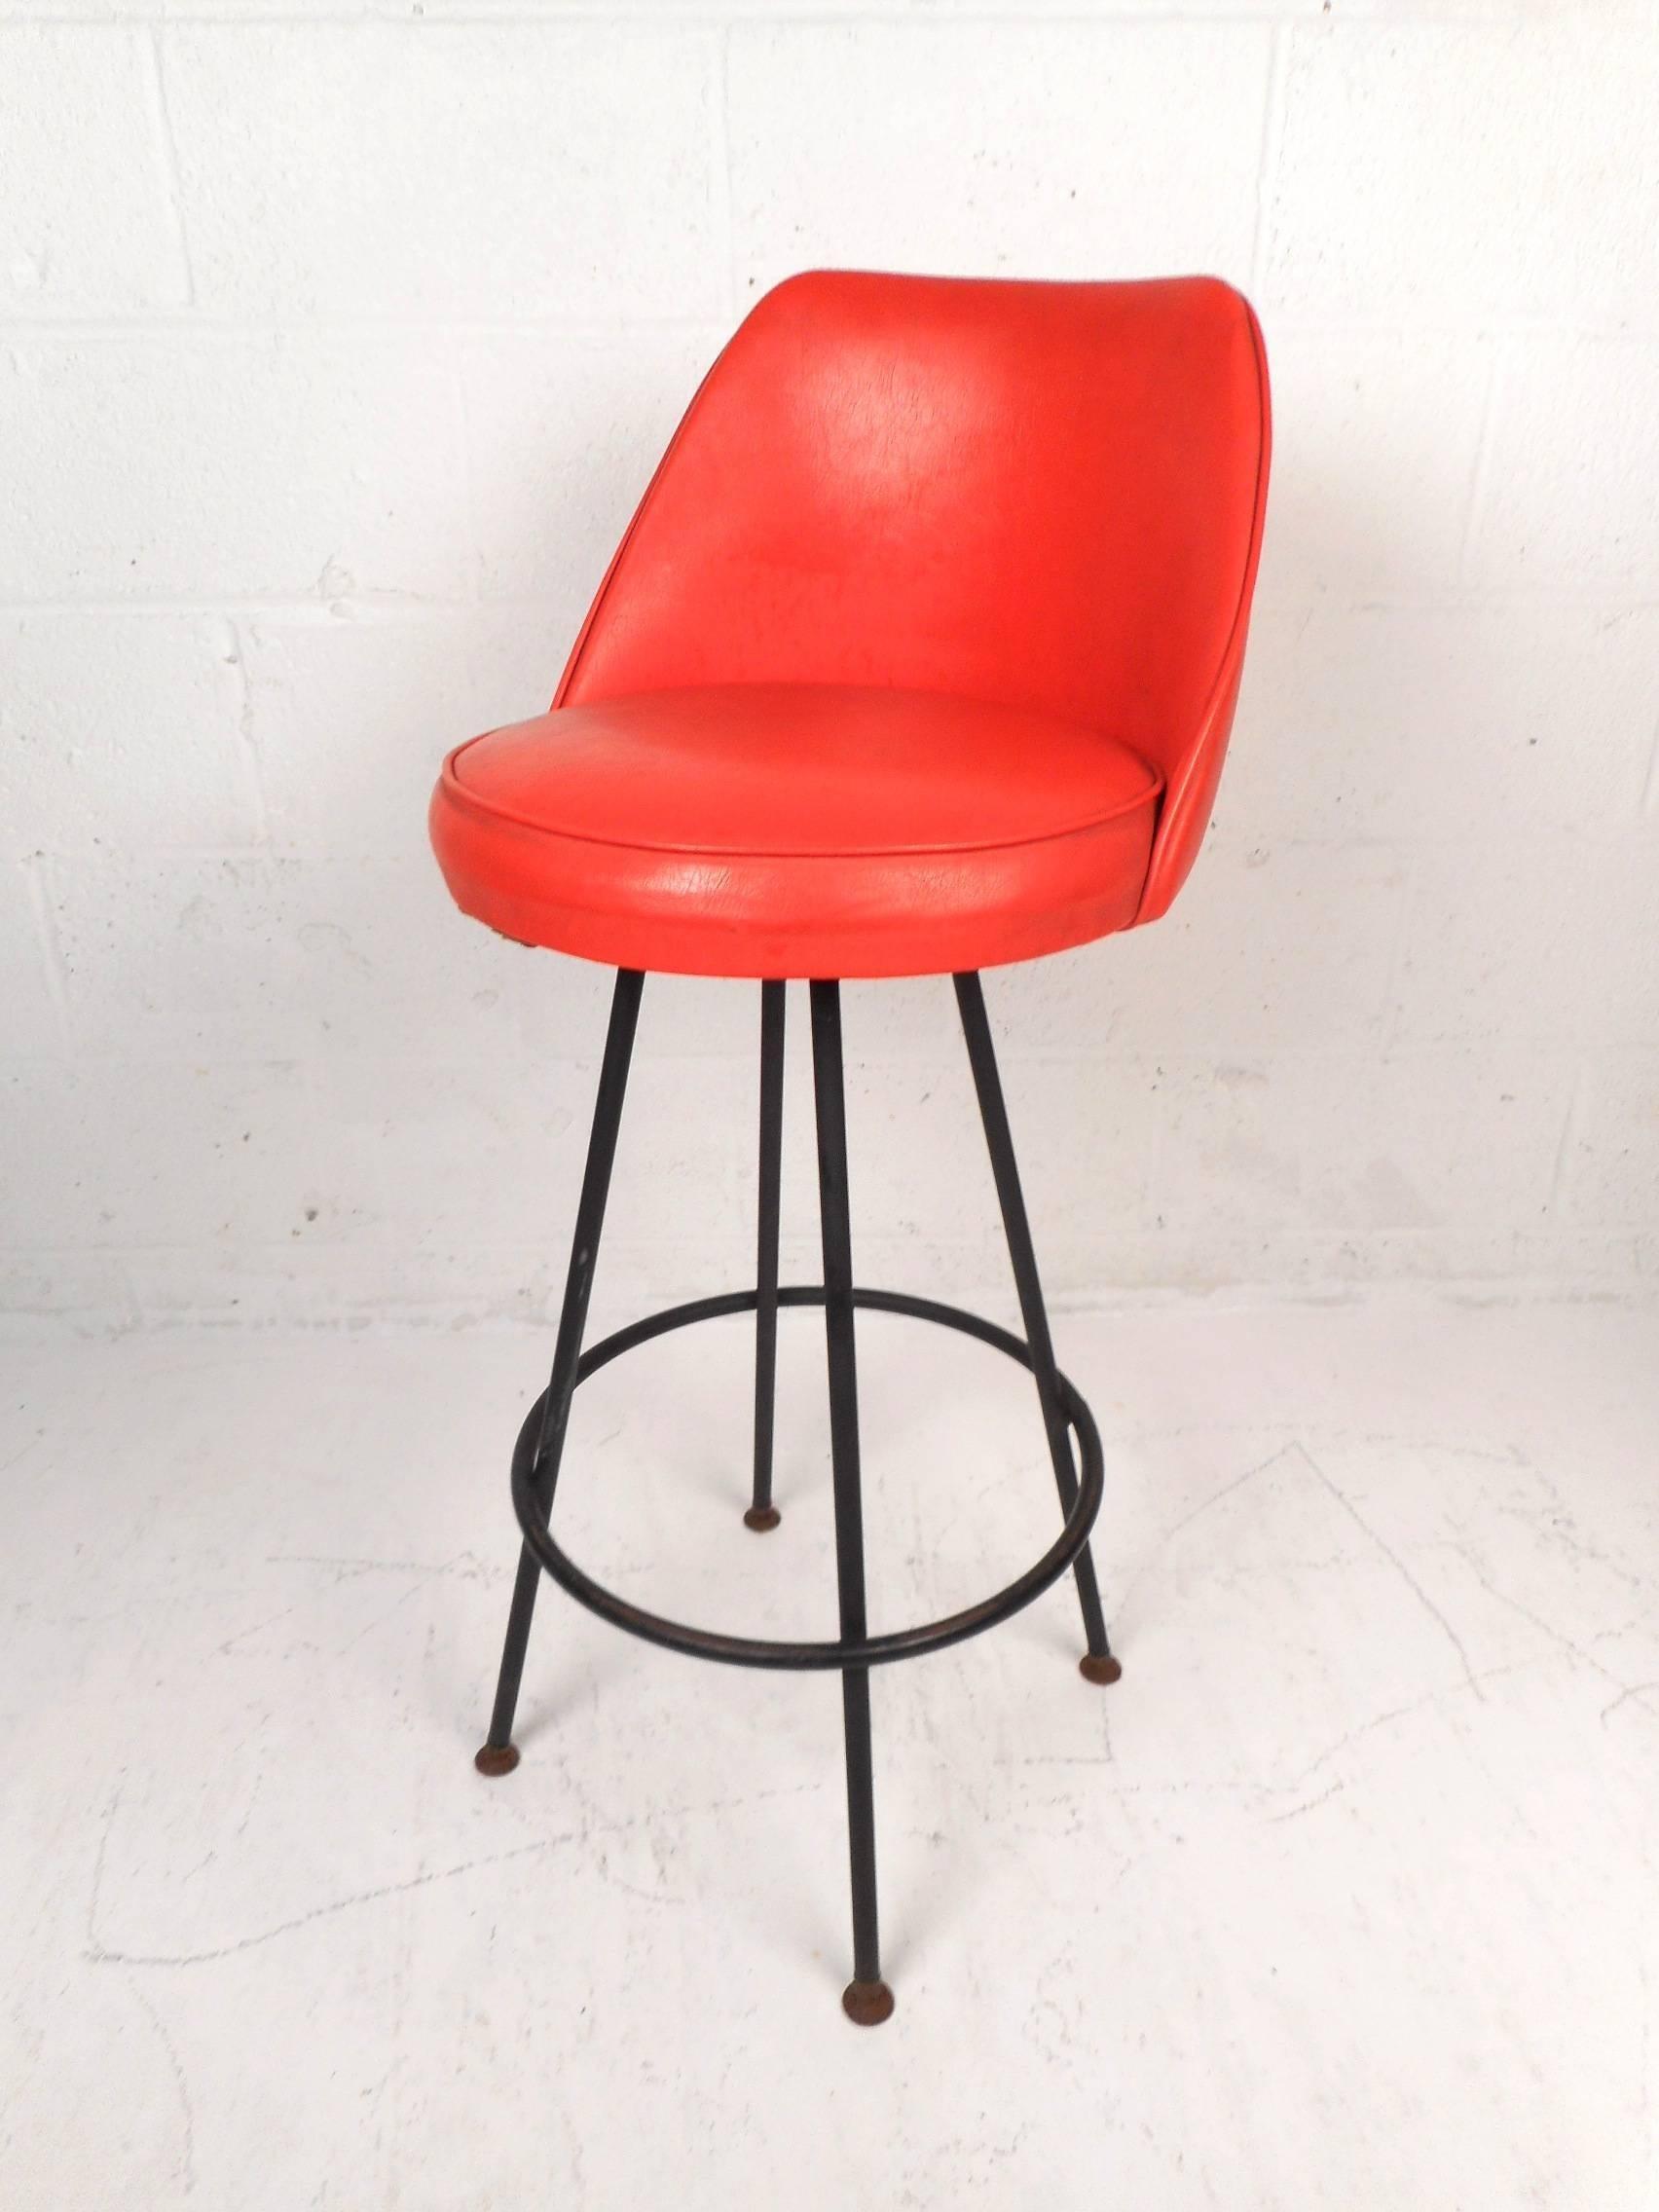 model checkered tool bar metal big shop tools red stool northern torin product stools